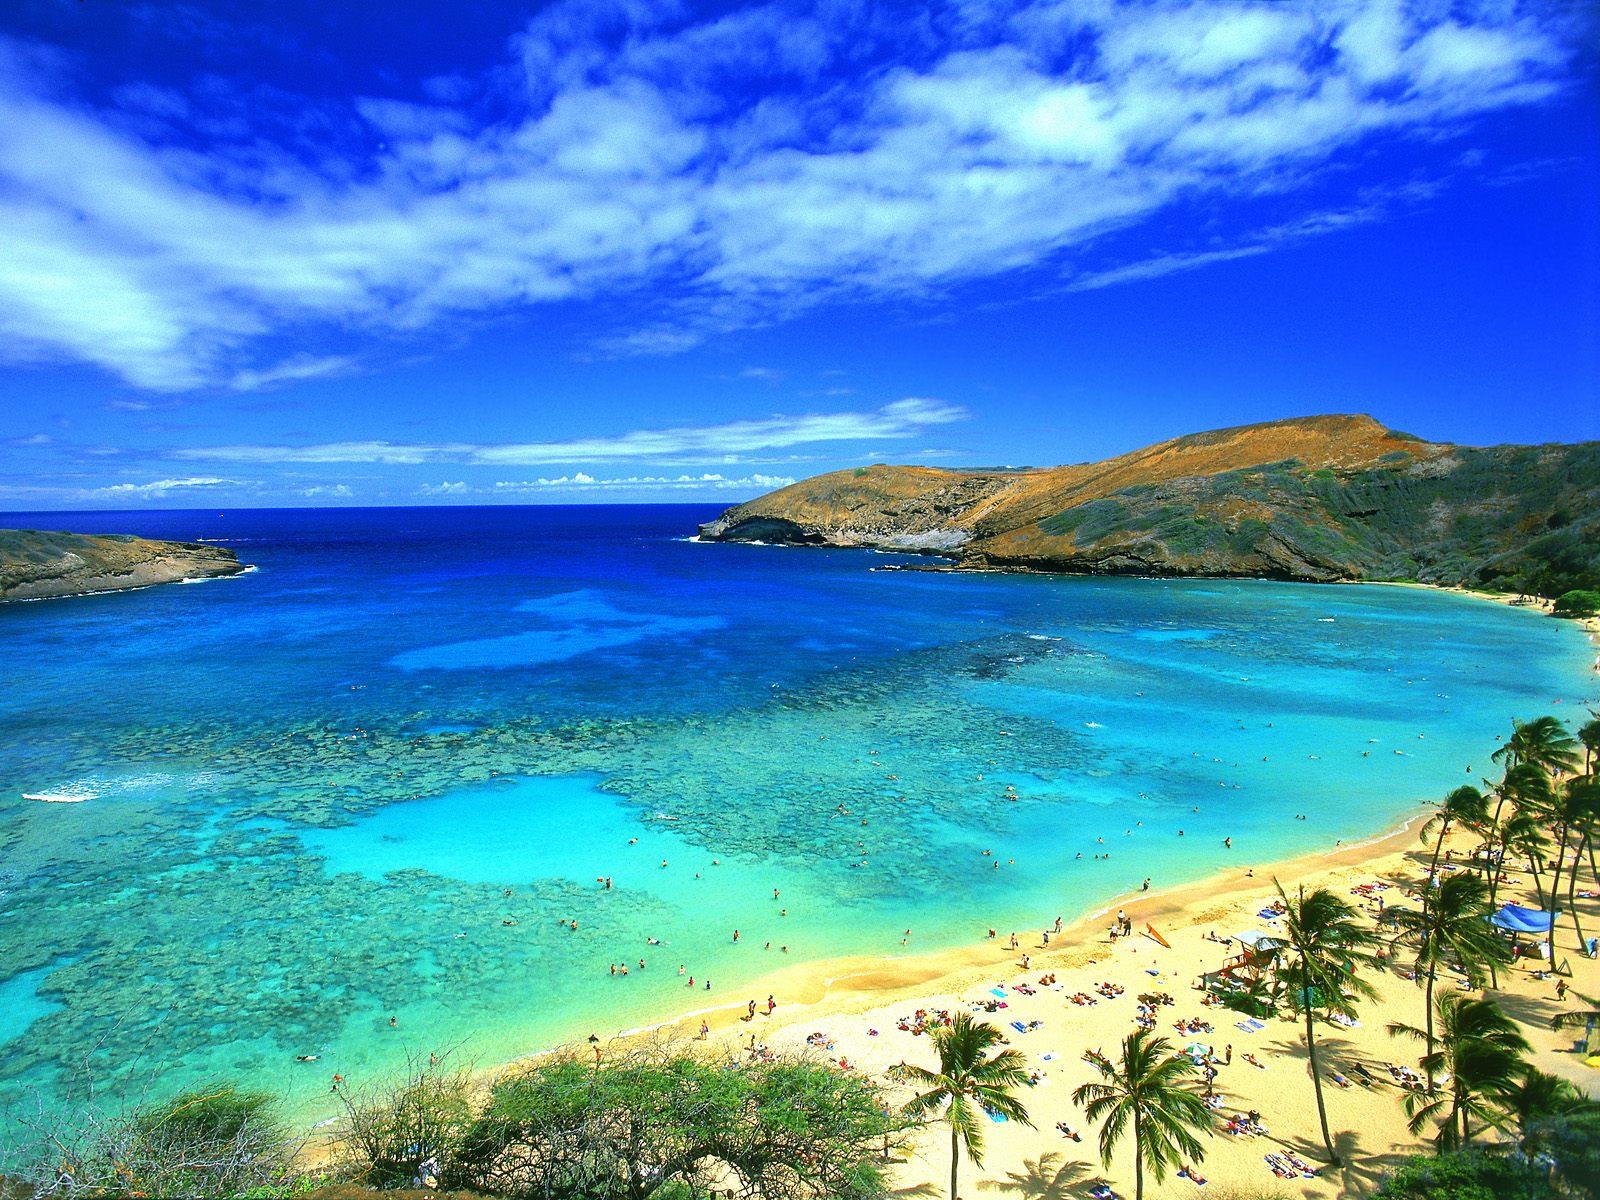 Hawaii Backgrounds - WallpaperSafari